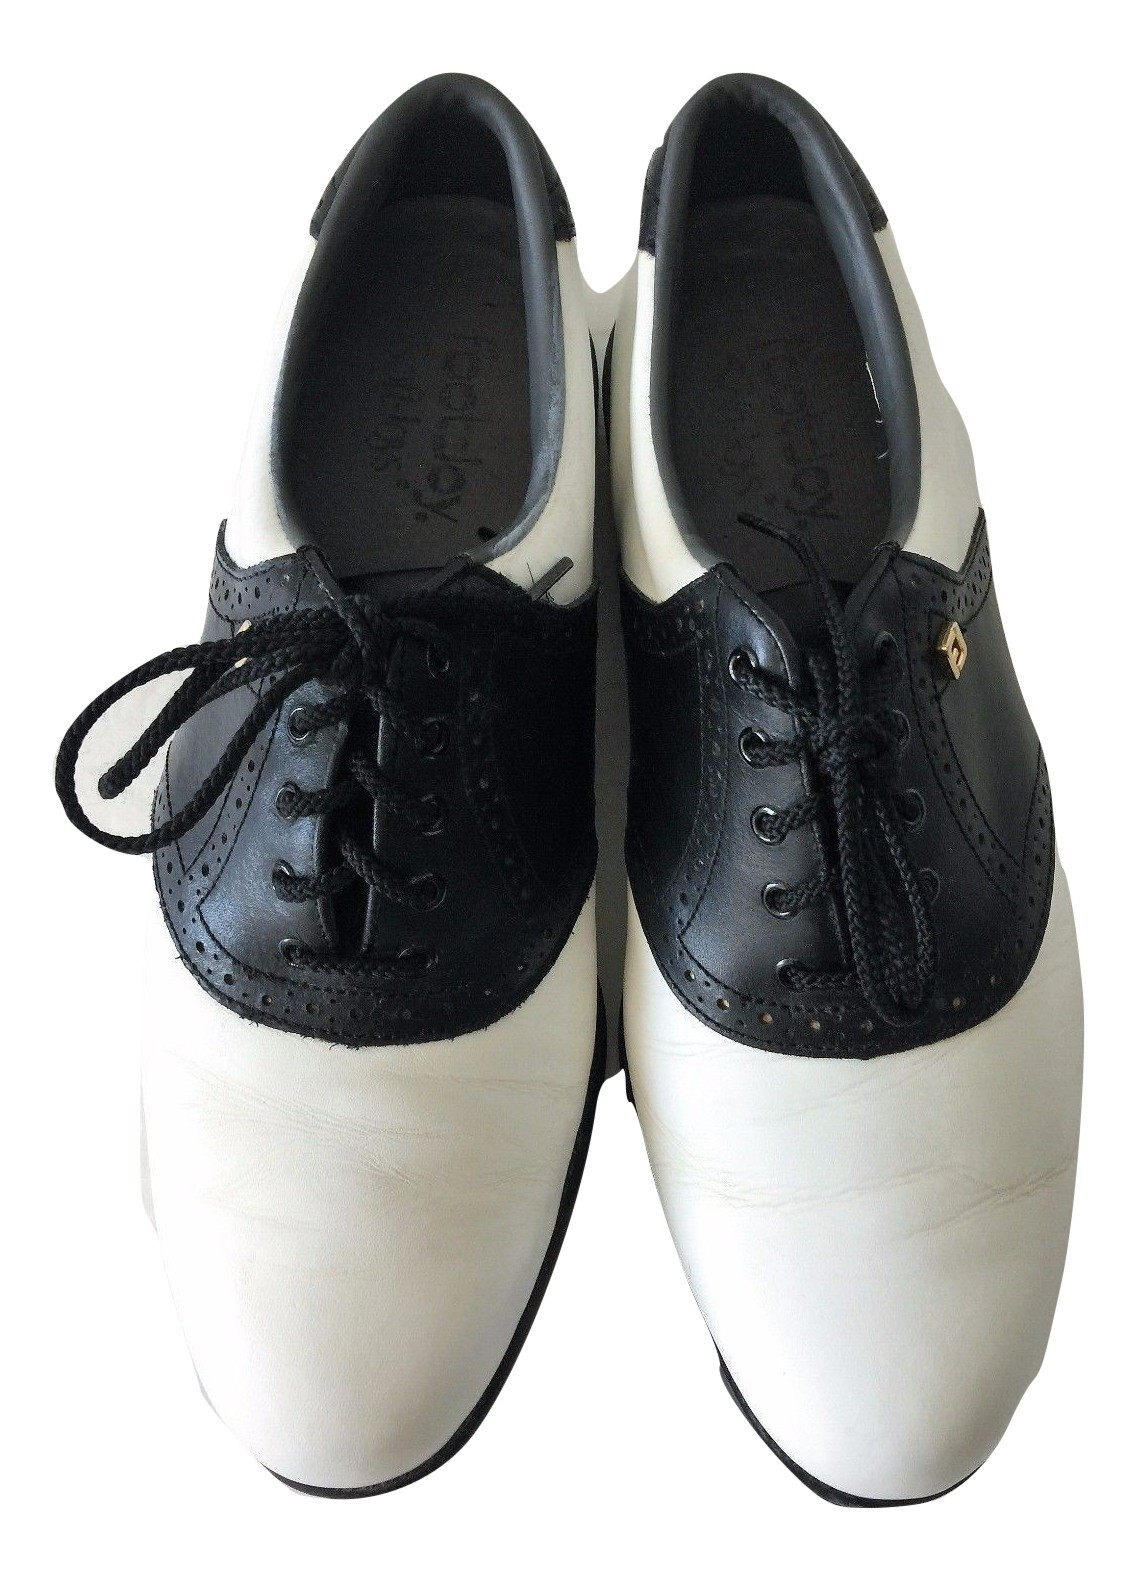 Footjoy Soft Joys Mens Black and White Saddle Leather Spikeless Golf Shoes  9.5 e92708ce2d8